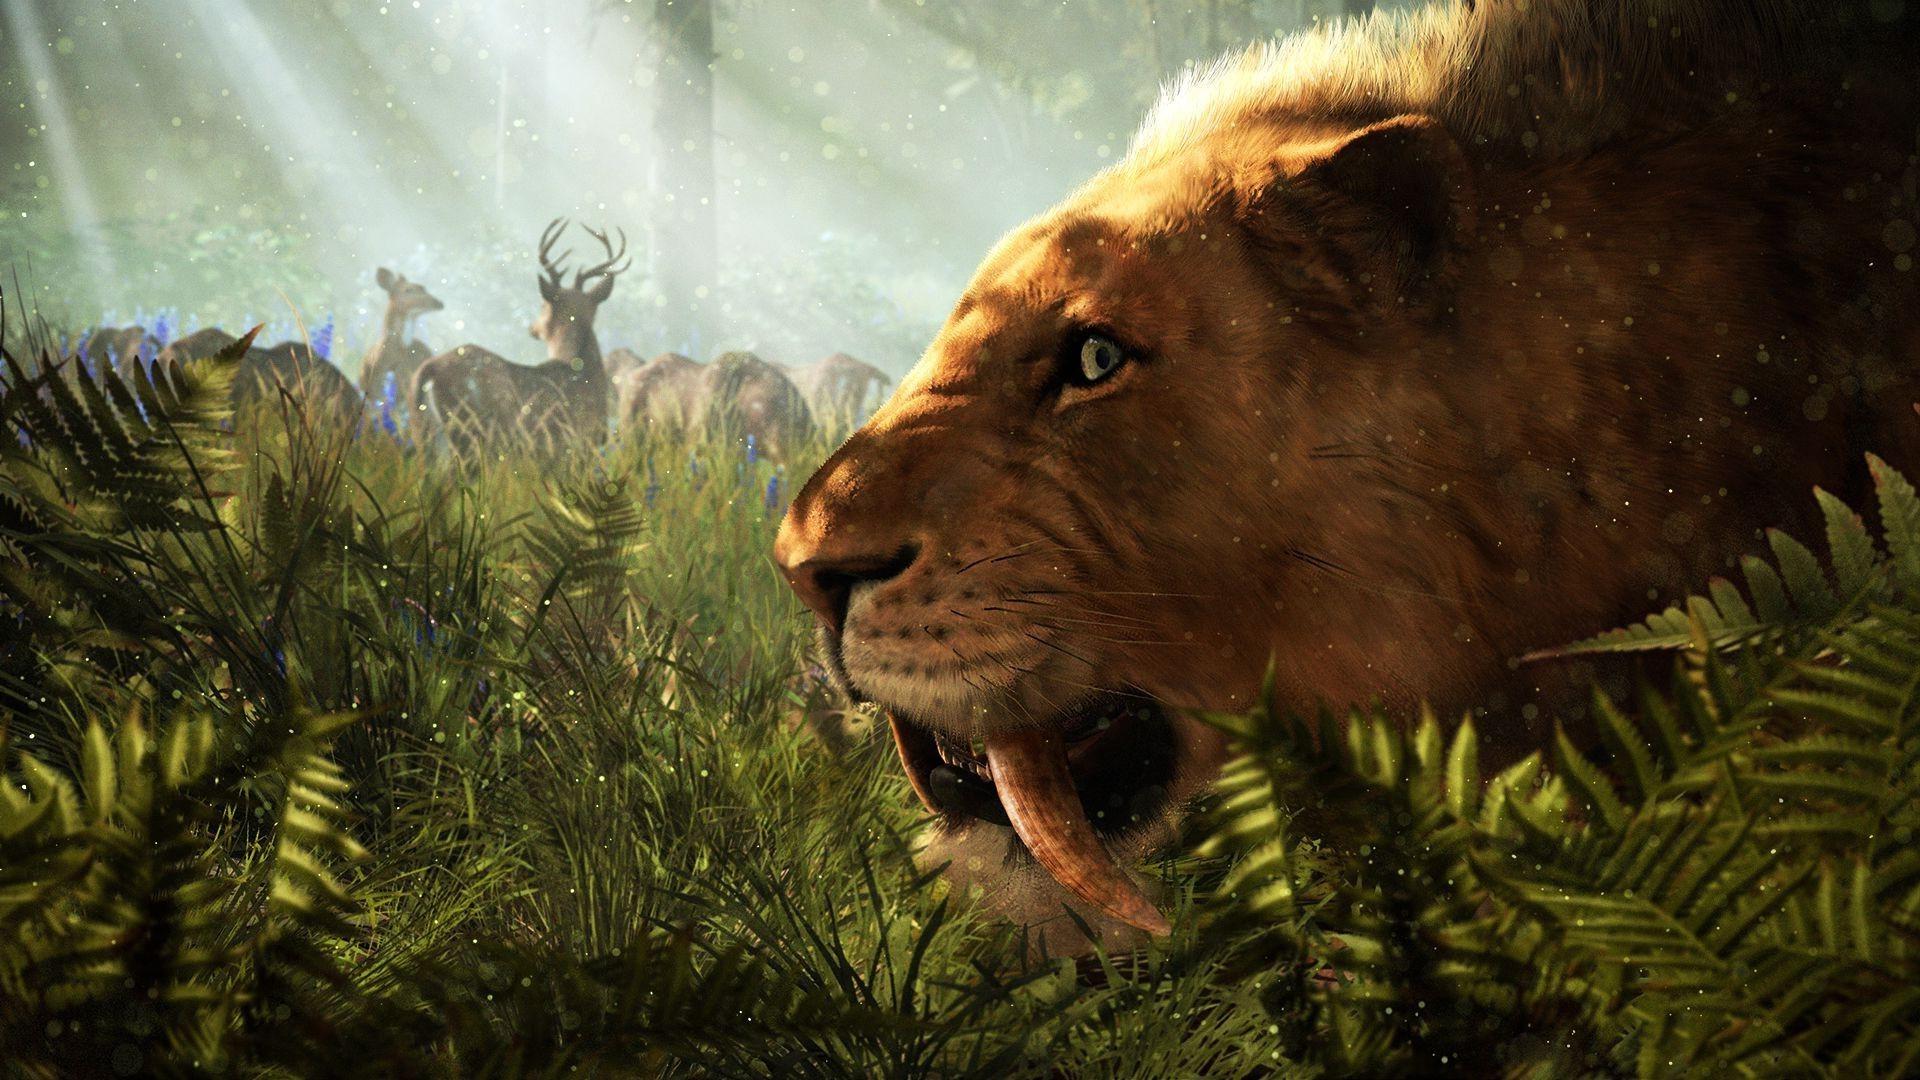 Far Cry Primal Artwork Video Games Wallpapers Hd: Far Cry Primal Wallpapers (85+ Images